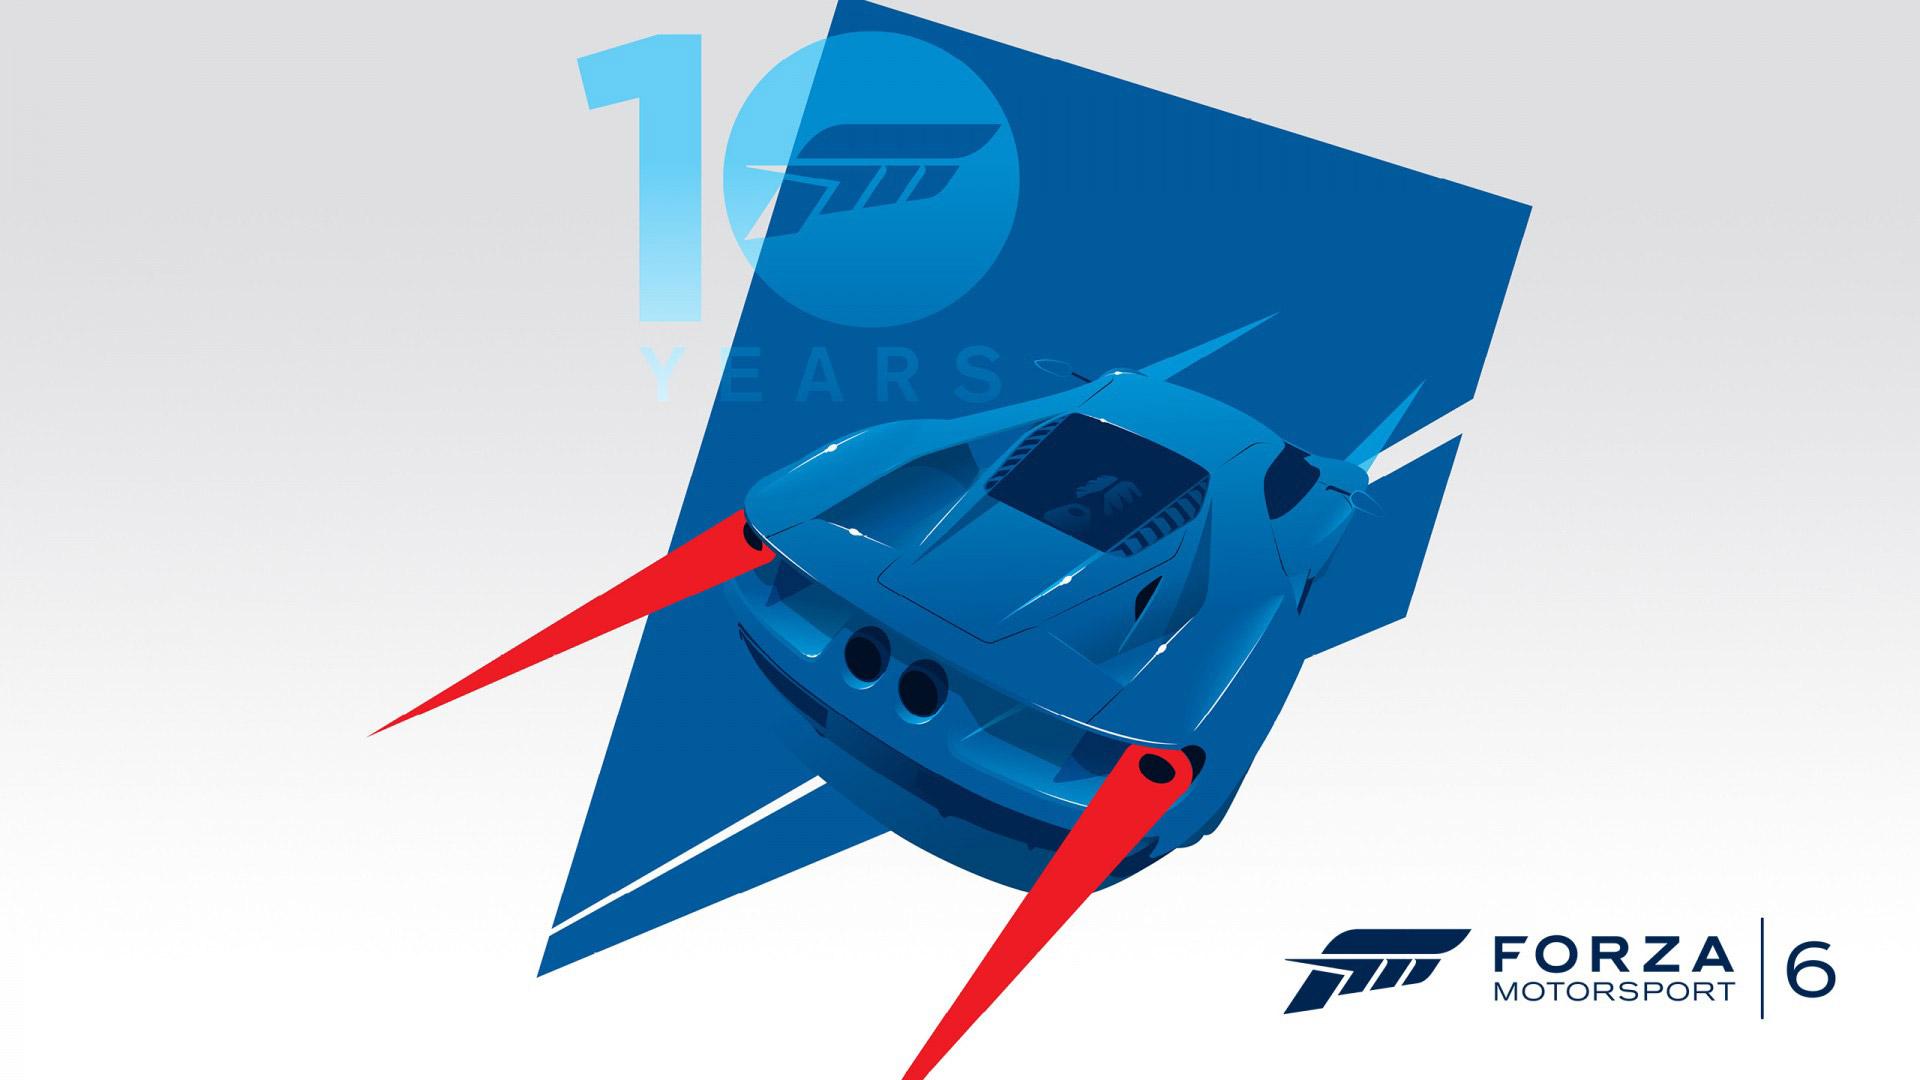 Forza Motorsport 6 Wallpaper in 1920x1080 1920x1080